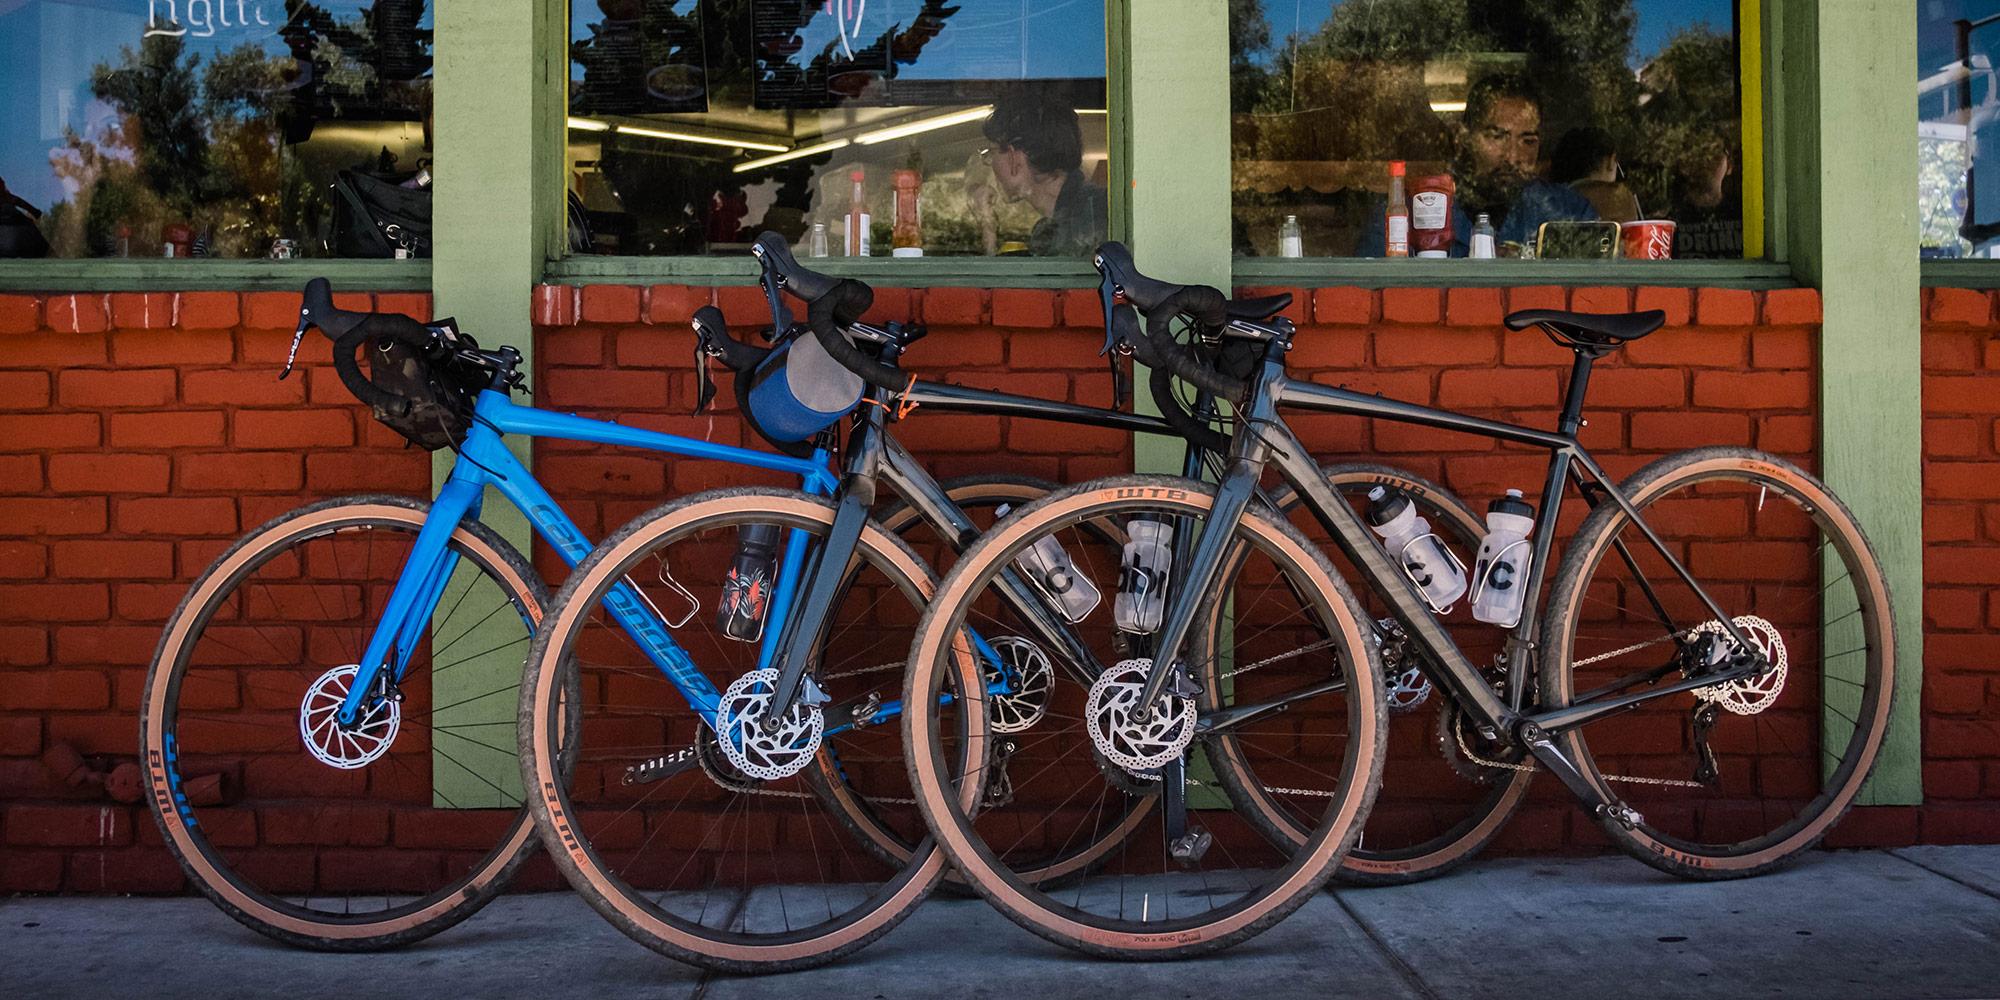 2019 Cannondale Topstone Gravel Adventure Bike